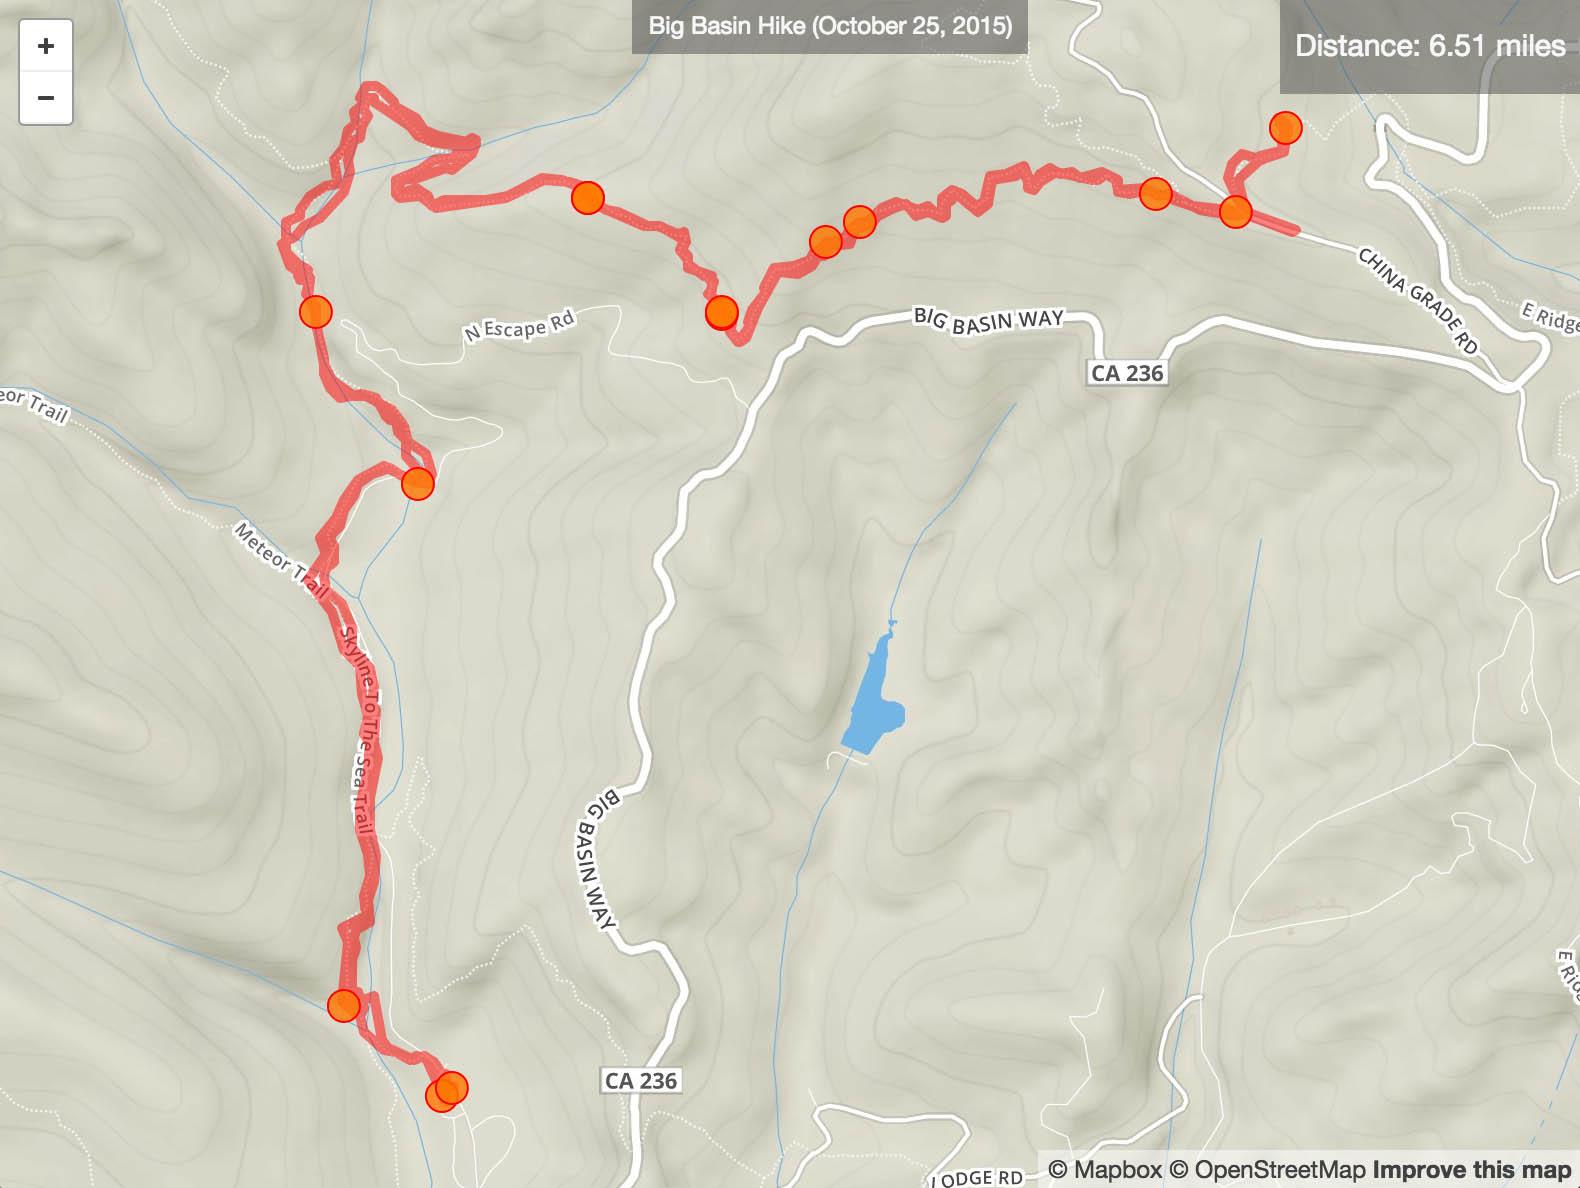 Big Basin October Hike